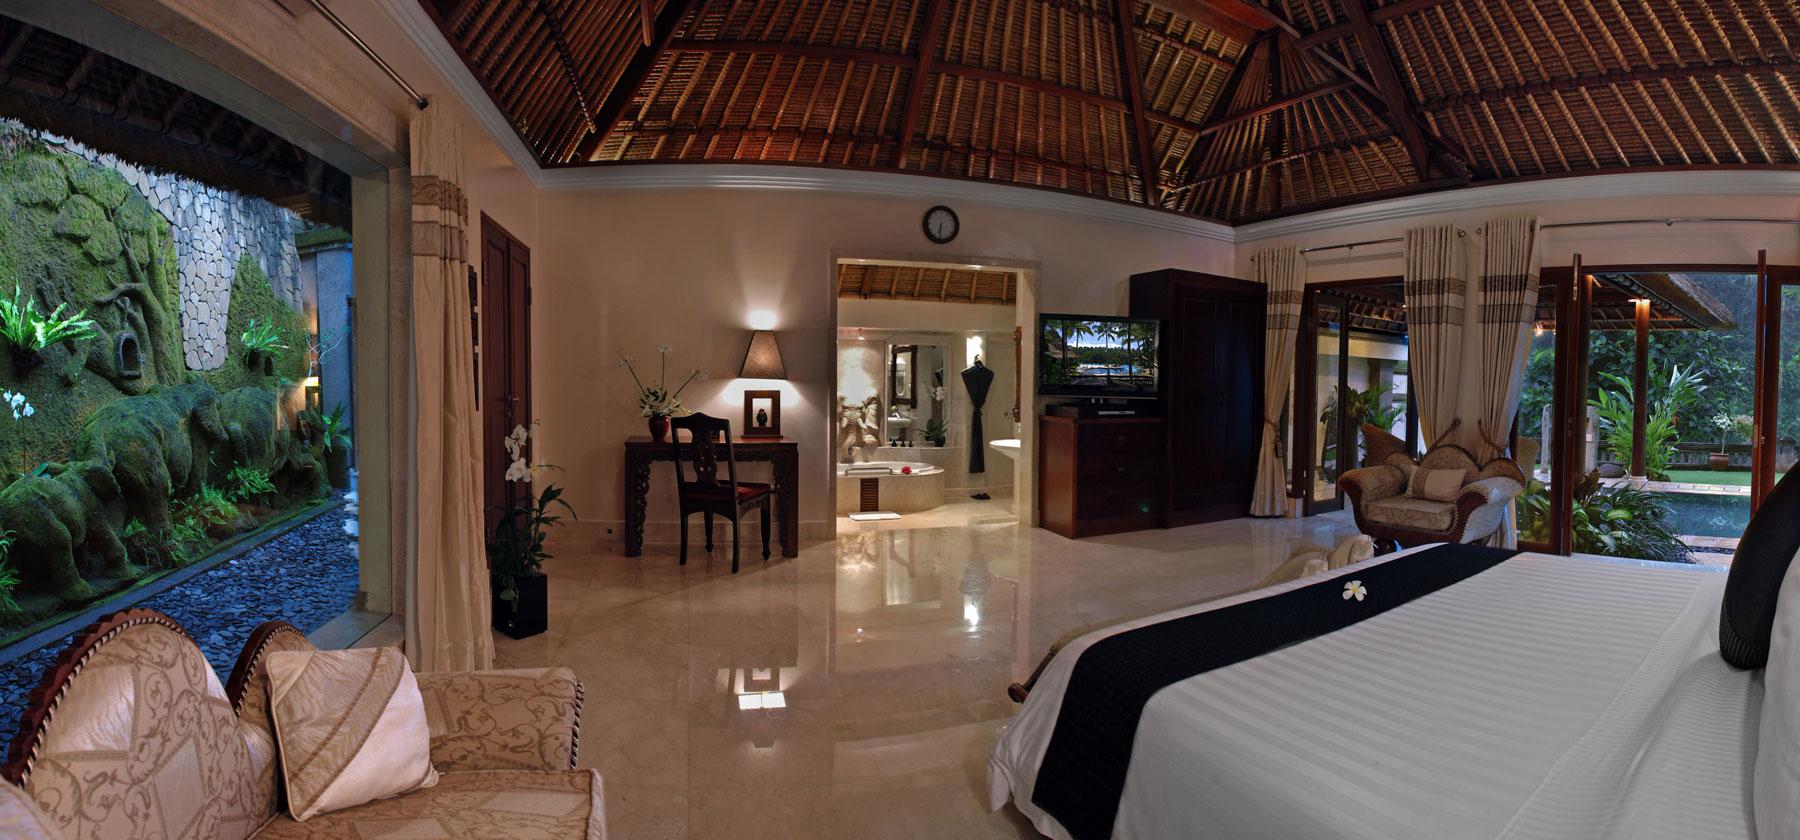 Viceroy Bali, a 5-Star Resort and Spa (17)